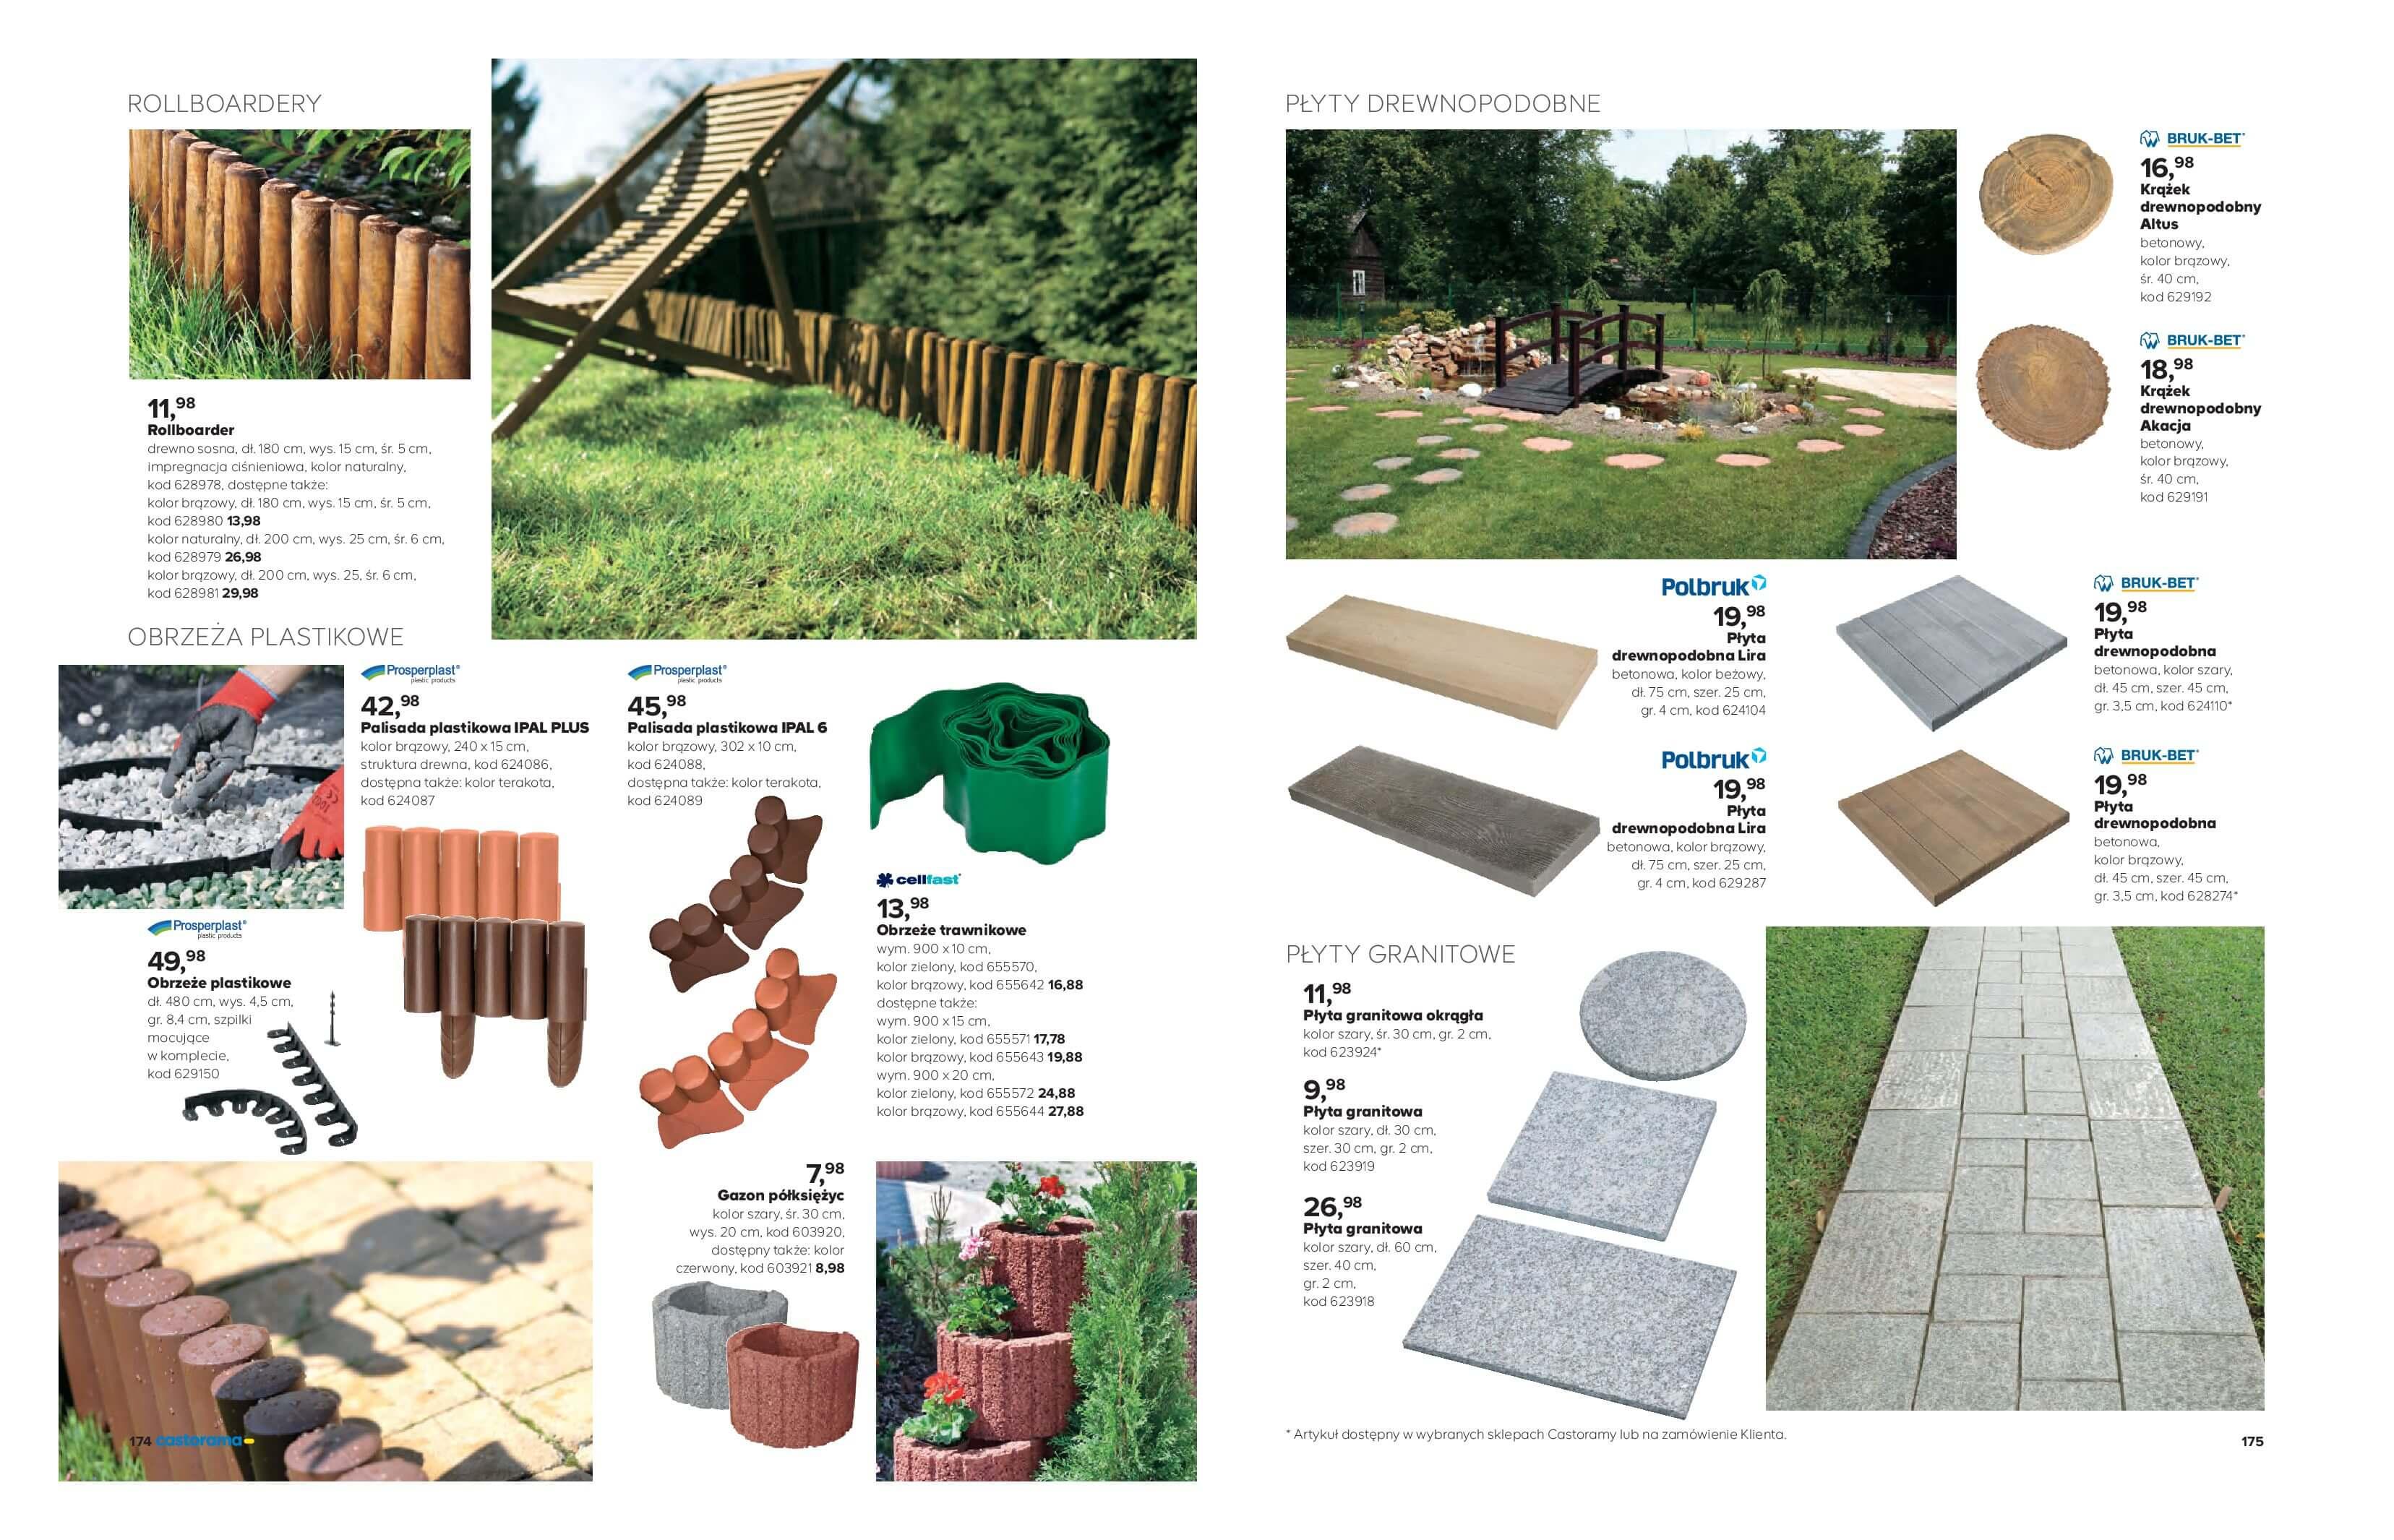 Gazetka Castorama - Katalog Ogród 2018-18.03.2018-31.08.2018-page-